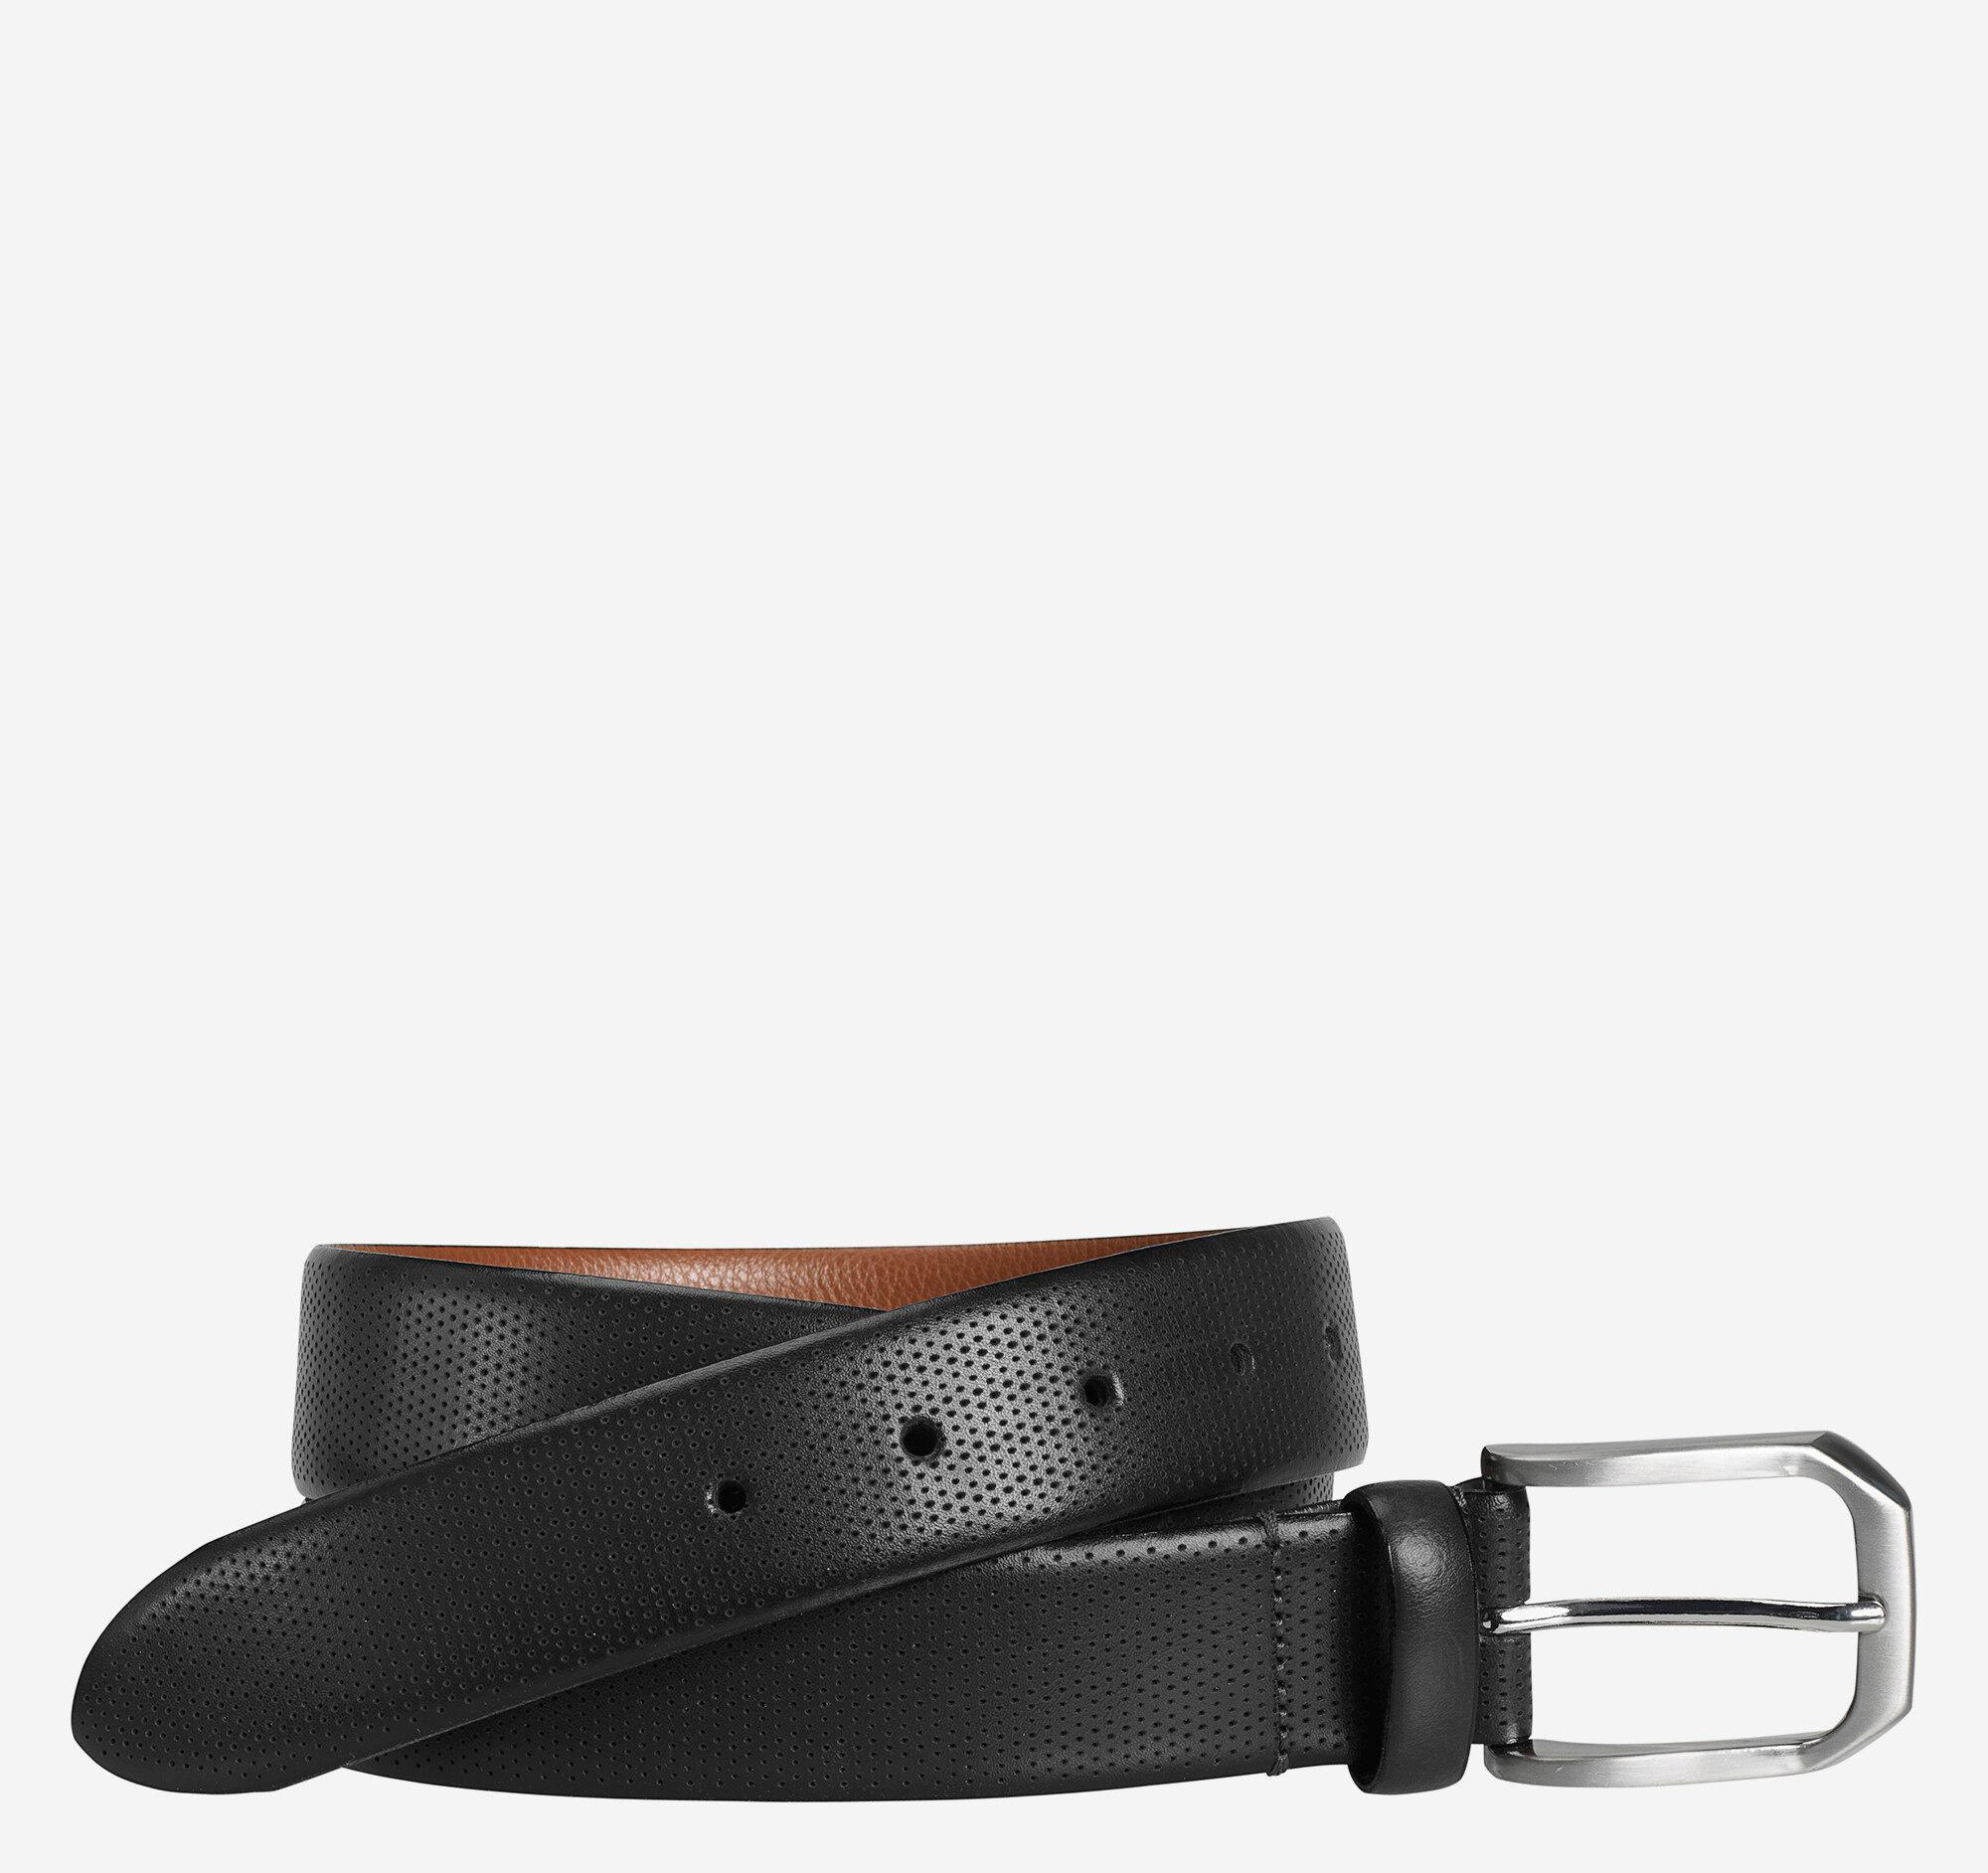 Johnston & Murphy Men's Micro Perf Belt - Black - Size 38